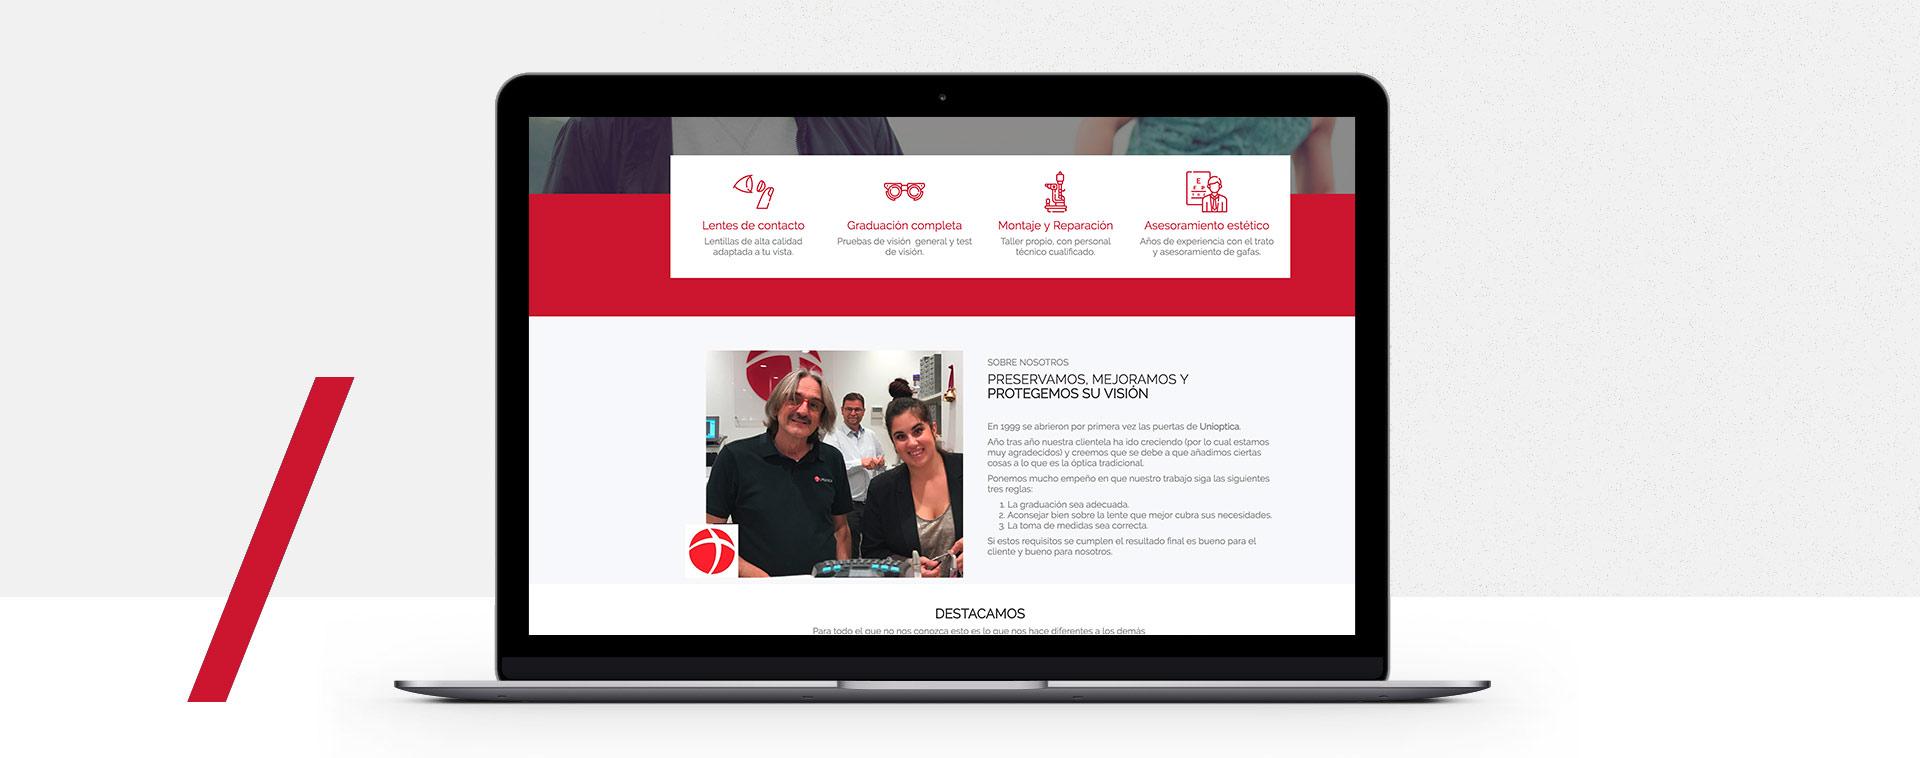 presentacion web fuengirola tienda optica danesa